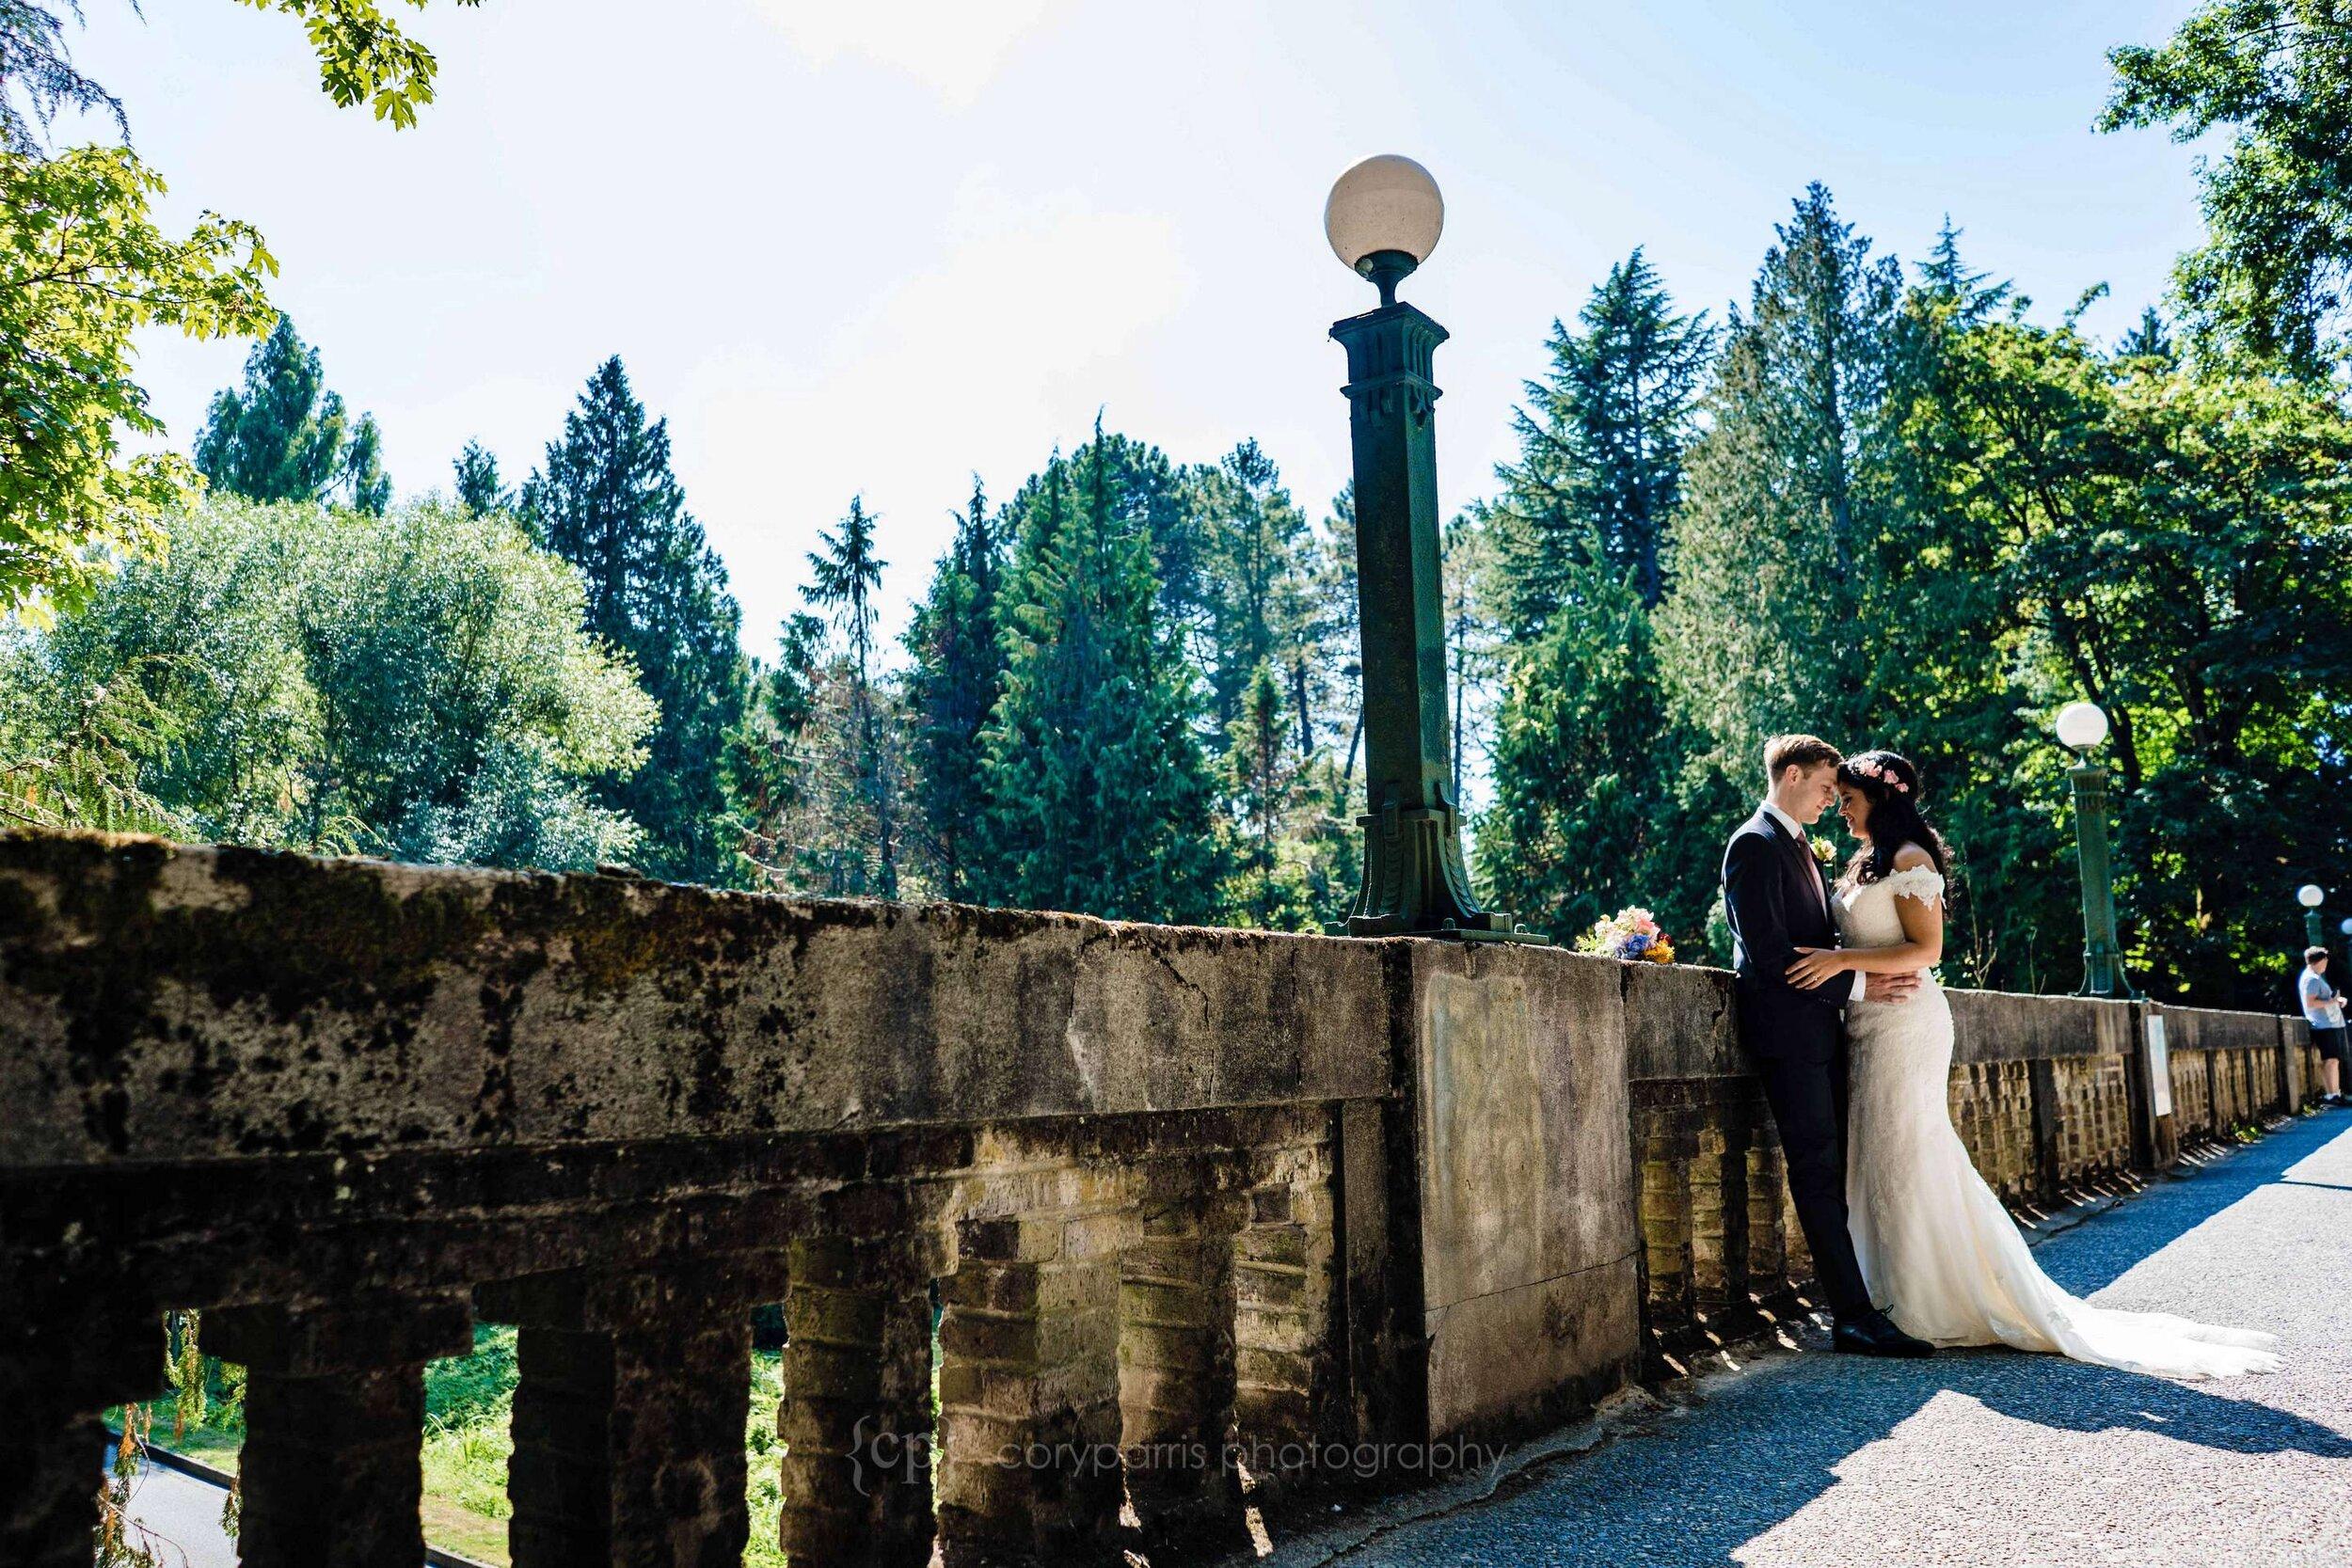 060-washington-park-arboretum-wedding.jpg